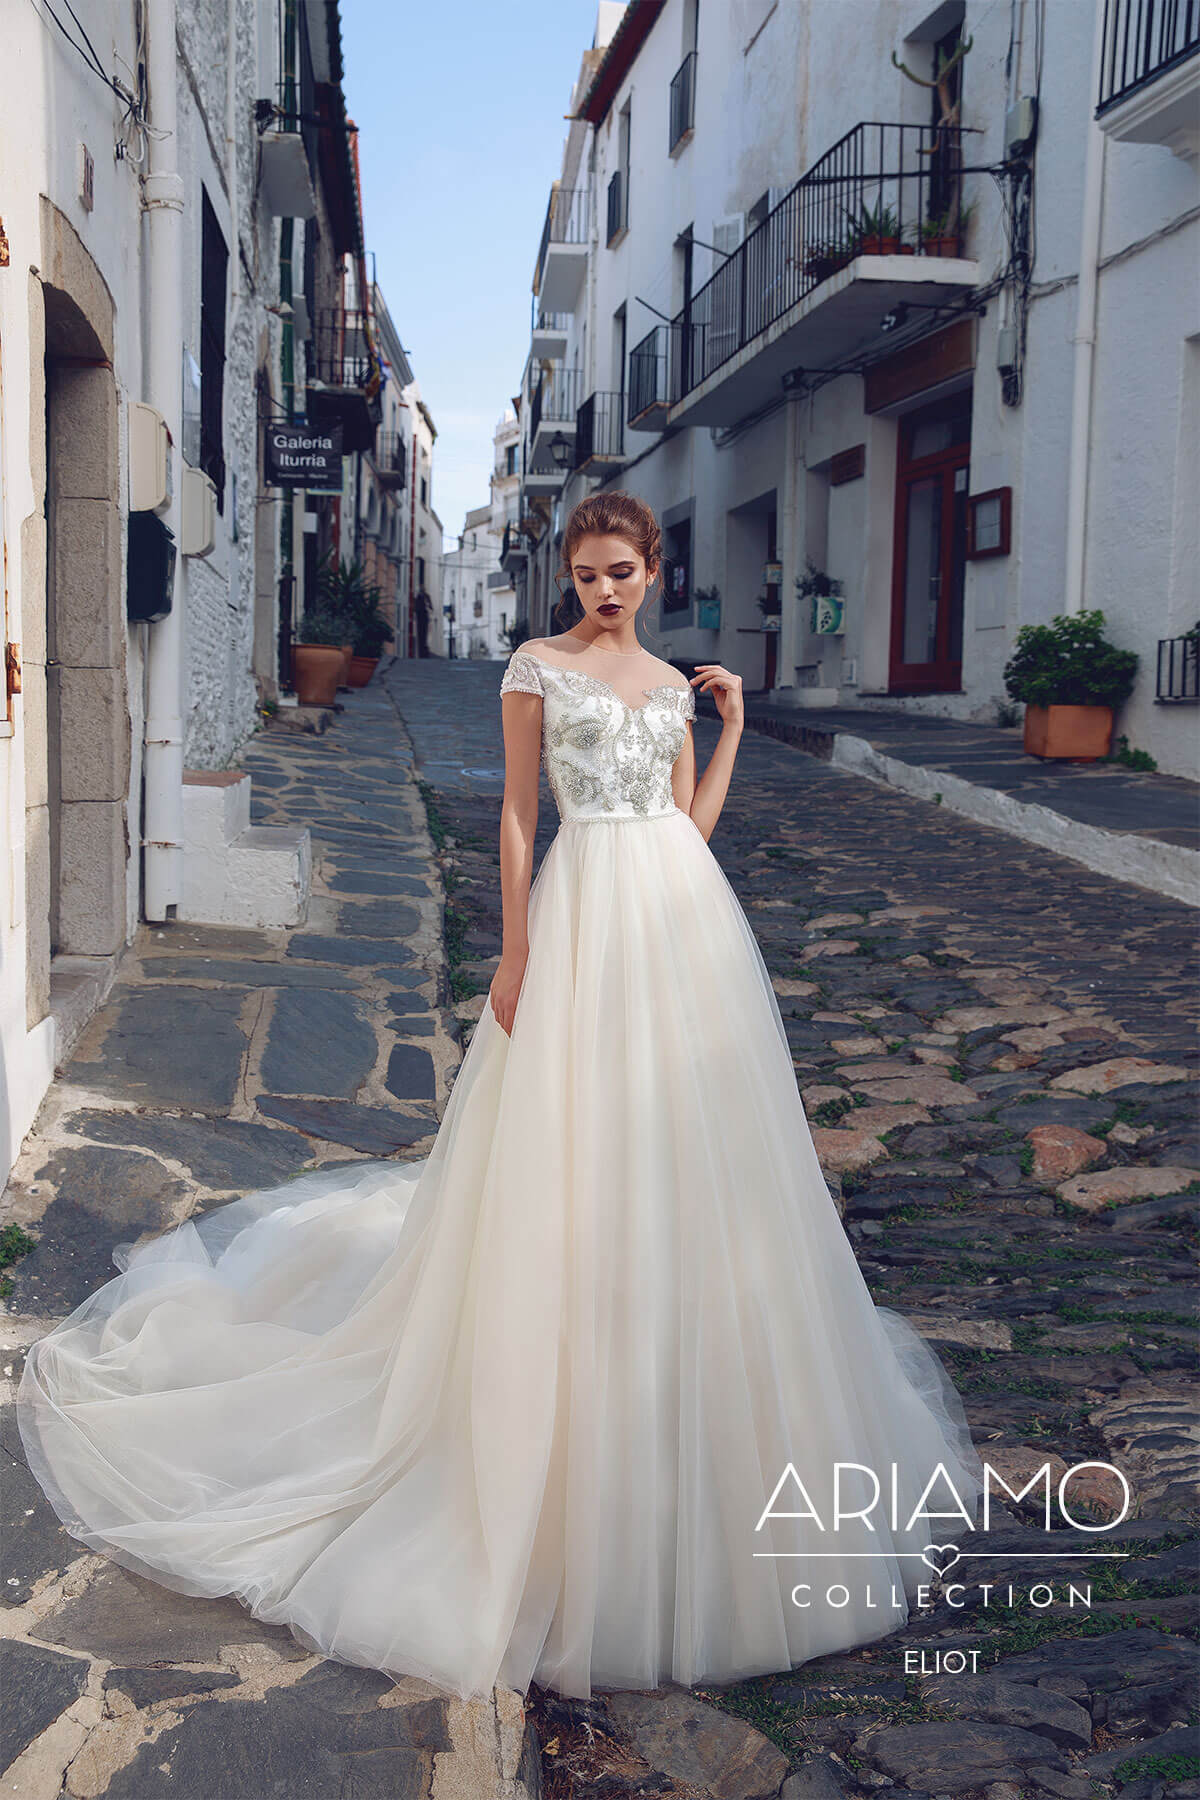 ELIOT – Tesoro/Ariamo - Suknie ślubne